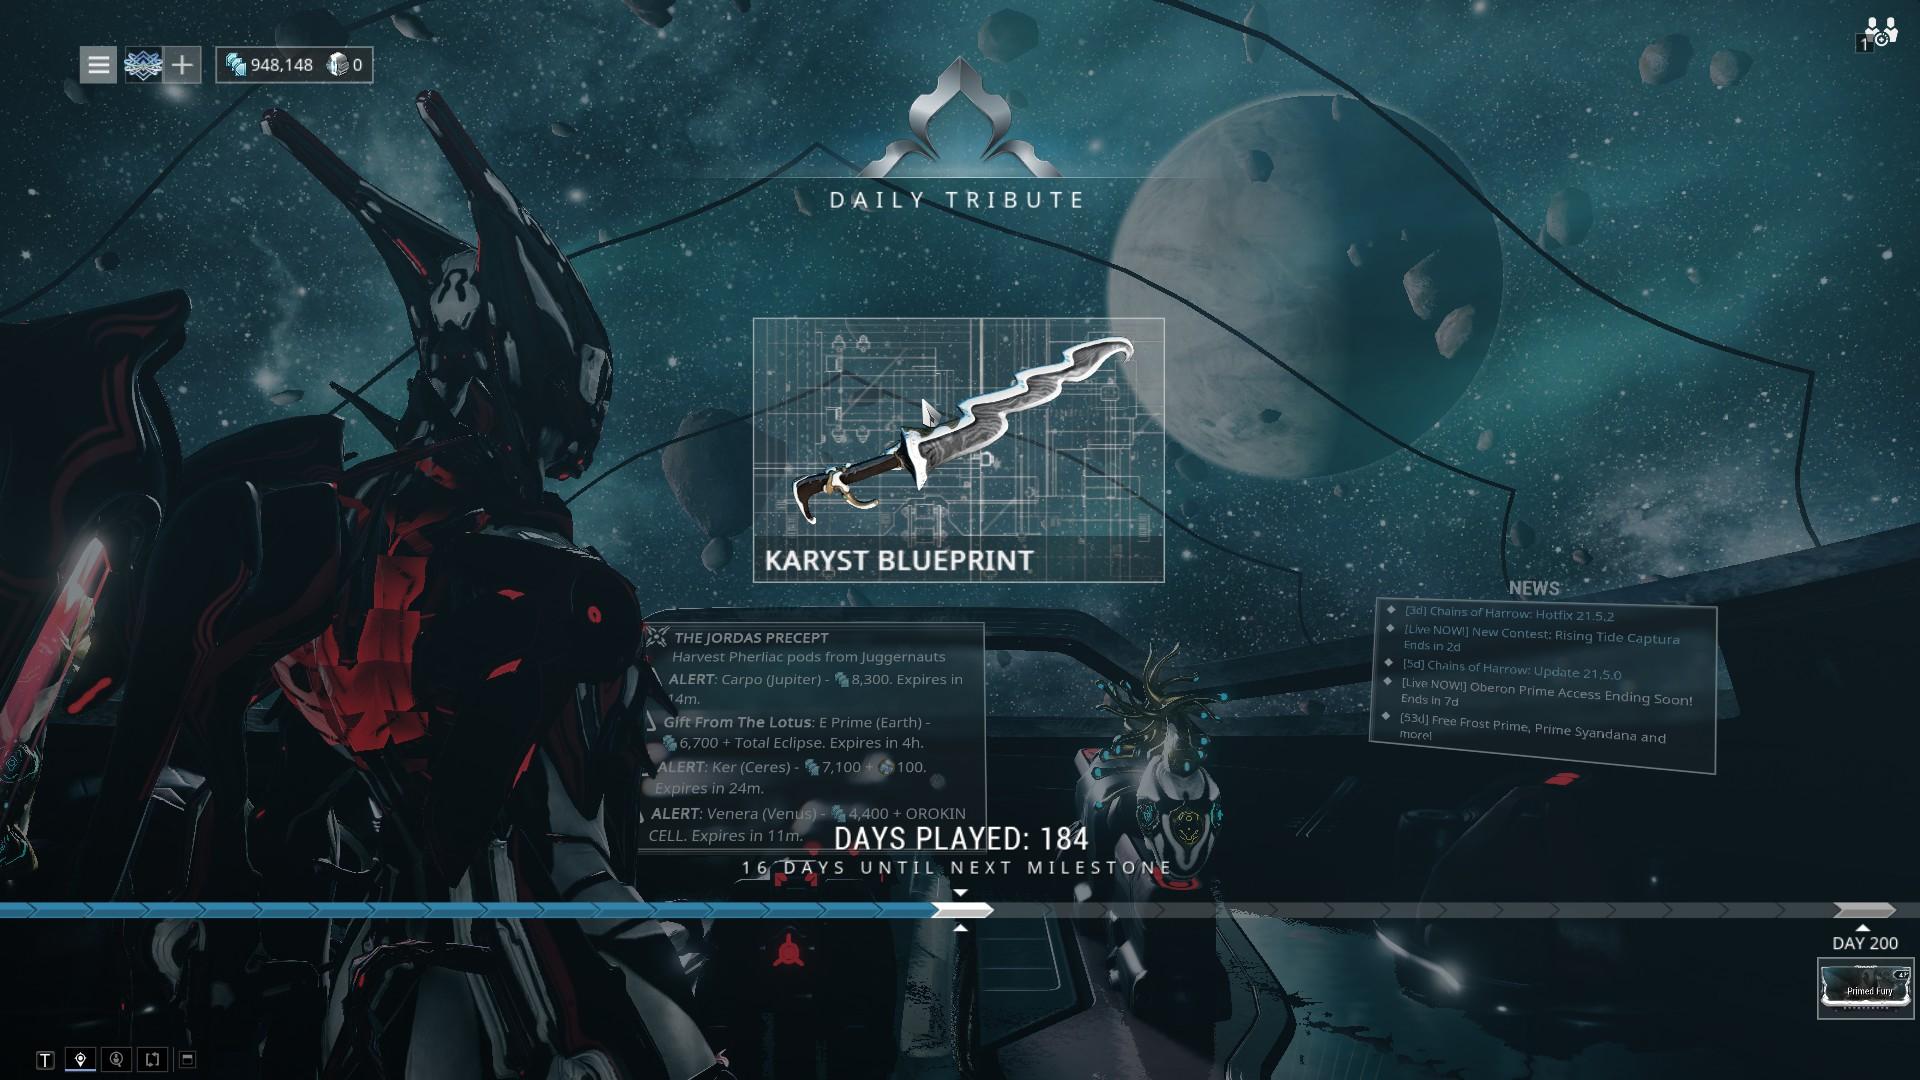 Steam community screenshot owo warframe malvernweather Image collections